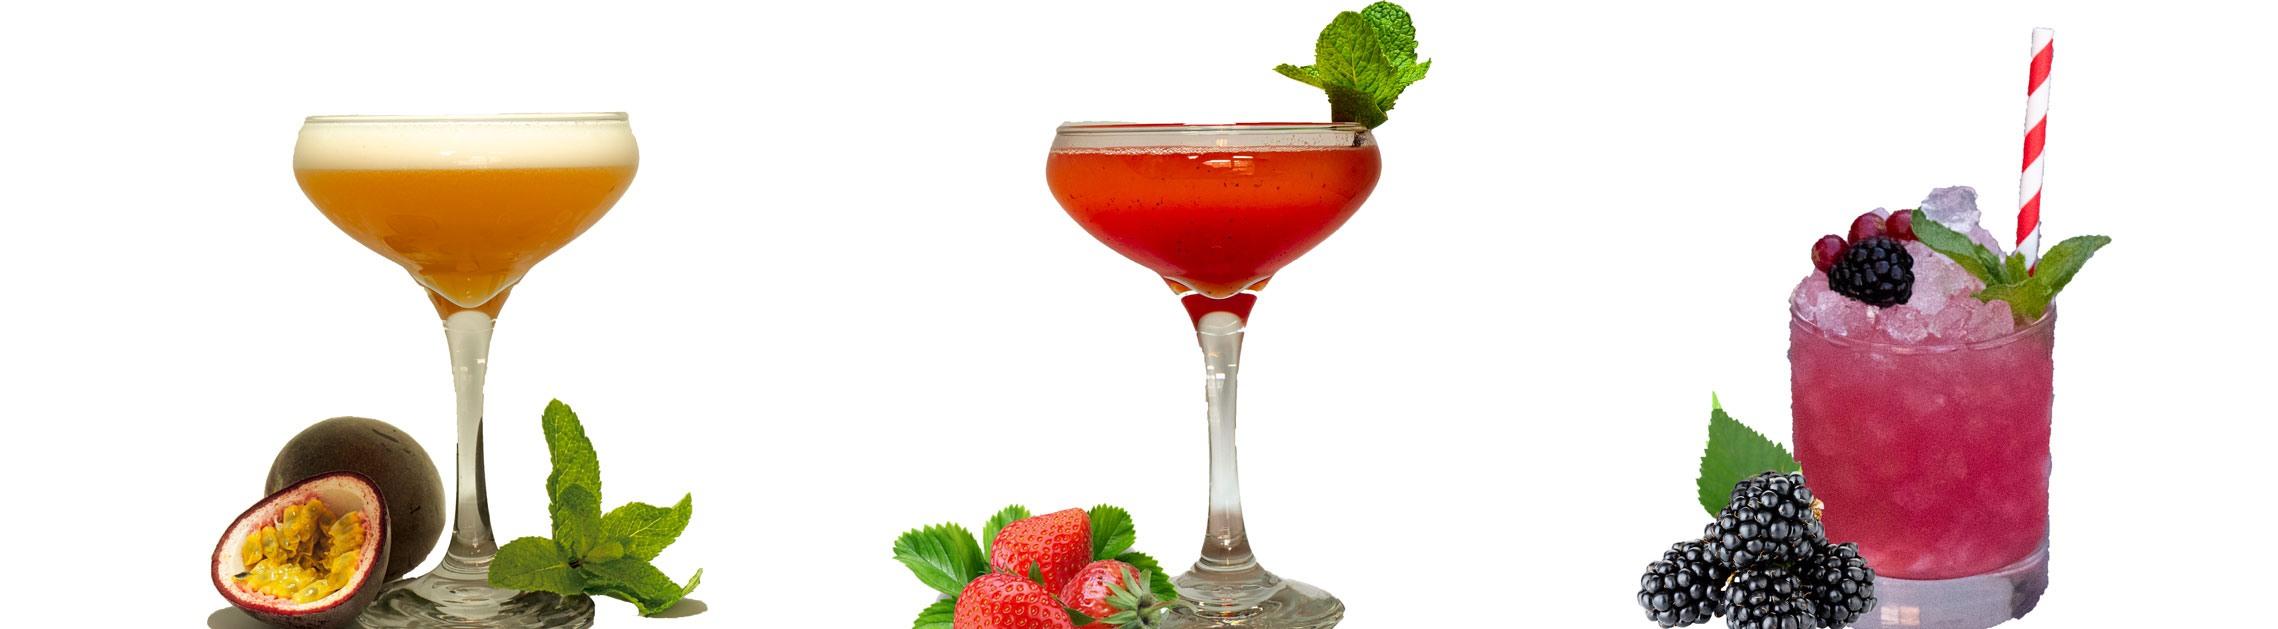 passionfruit cocktails strawberry cocktails bramble cocktail